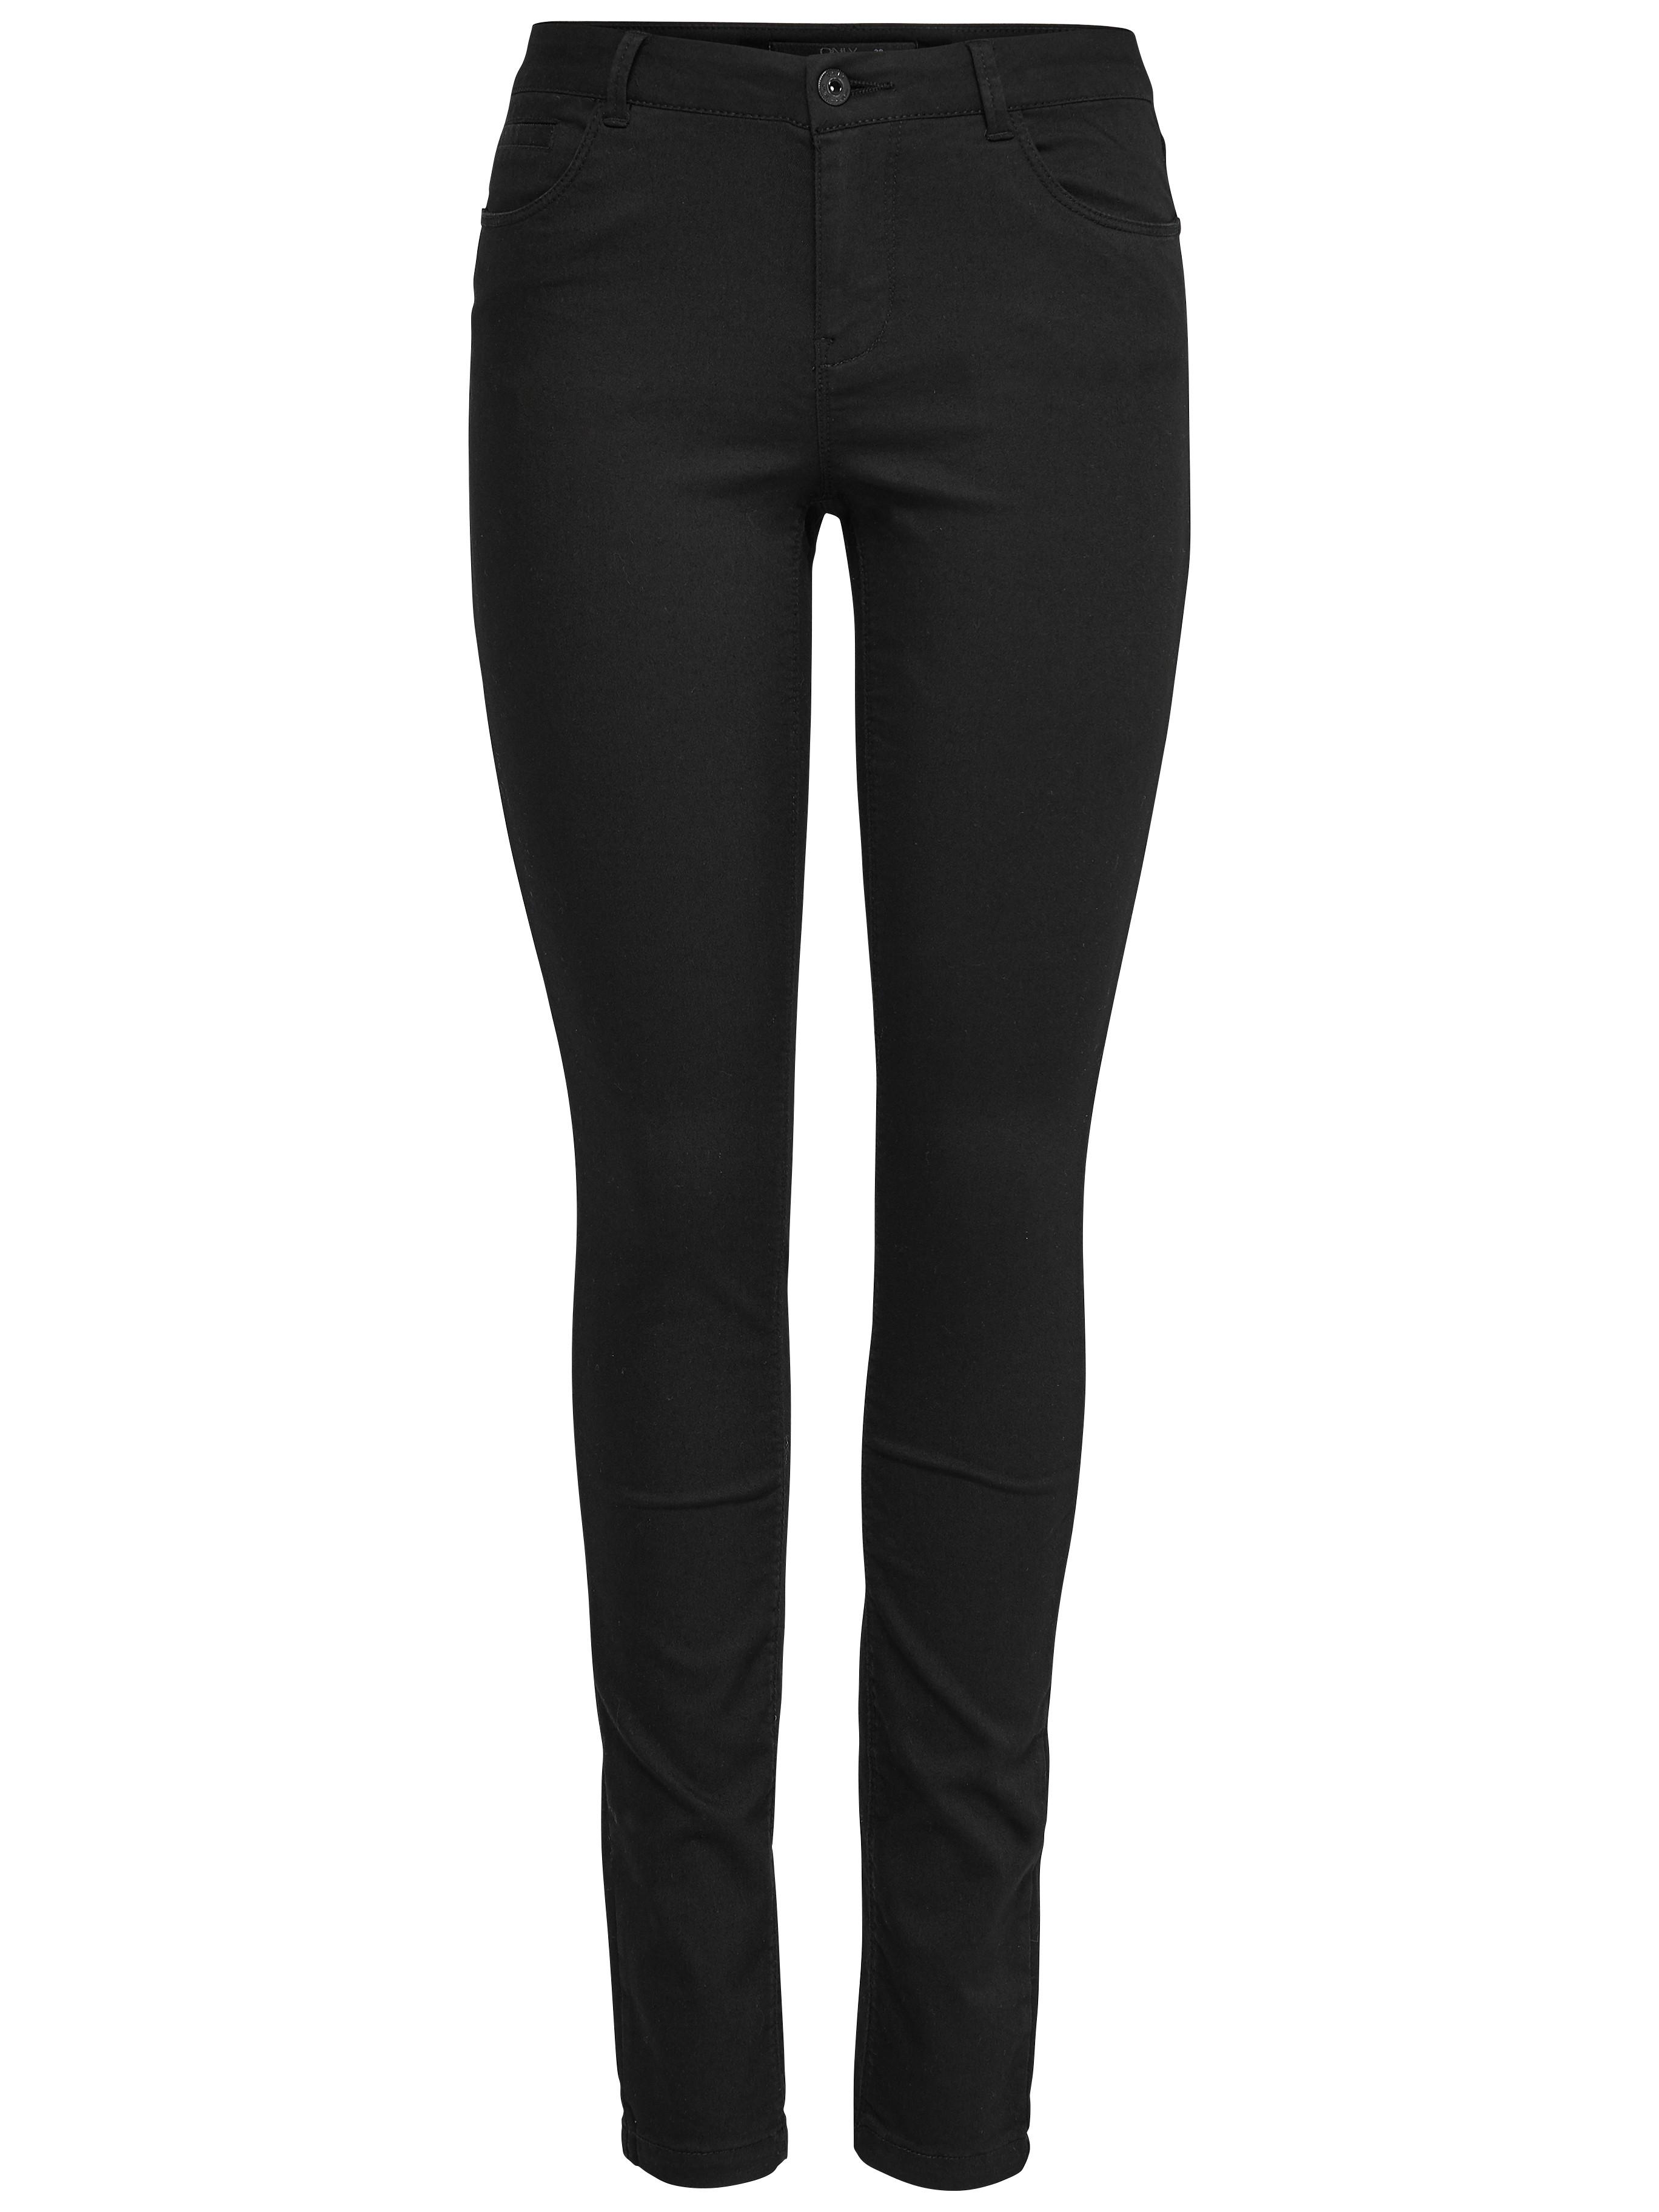 ONLY Damen Hose Jeans onlELENA REG SKINNY PANT NOOS schwarz Damen ... a84a3b6928